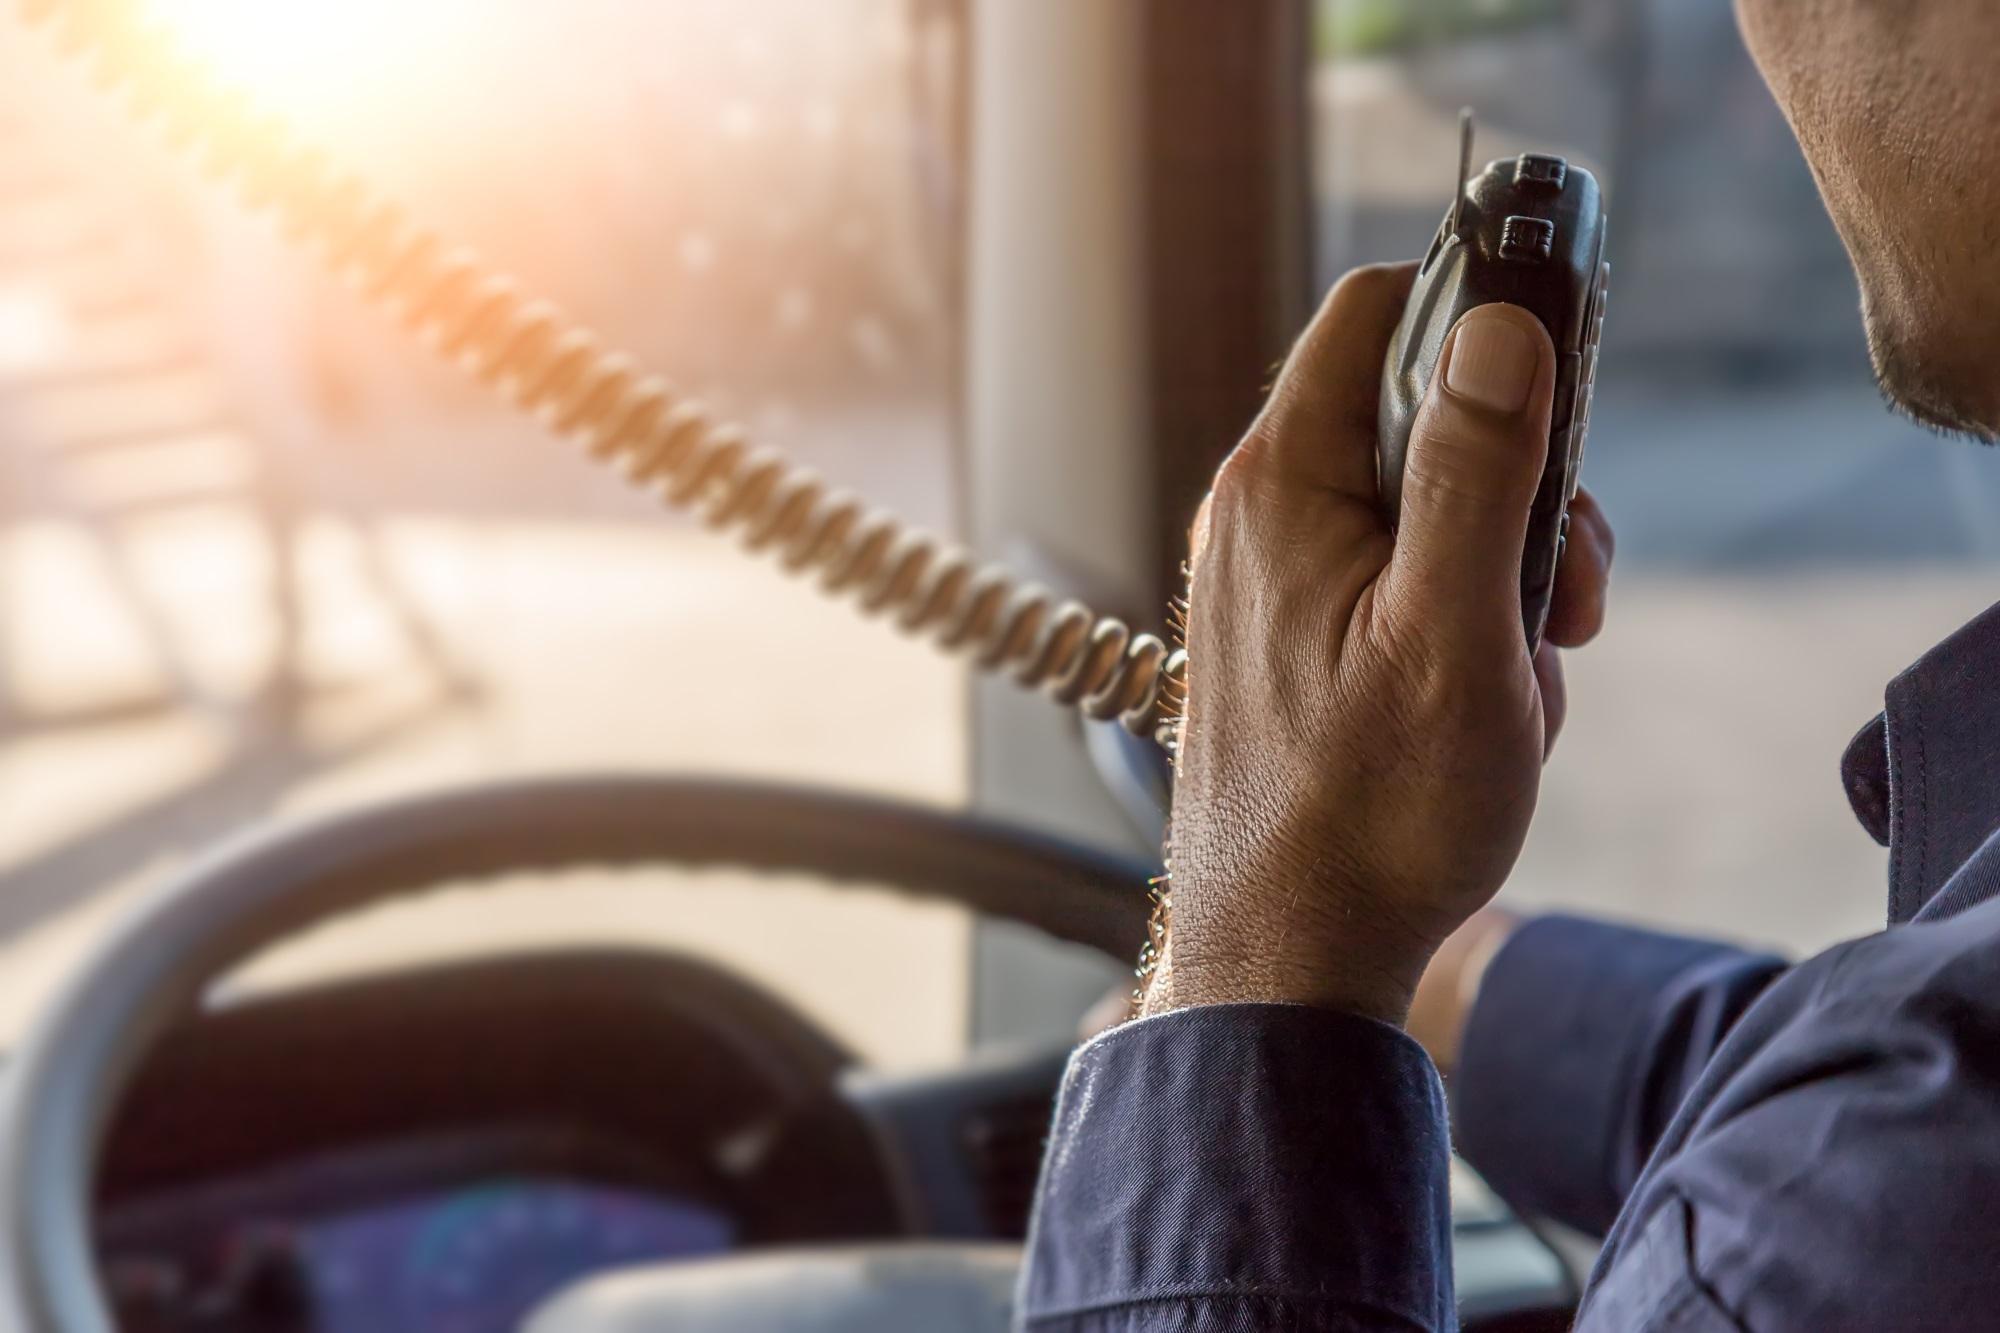 camionista parla via cb radio nel camion